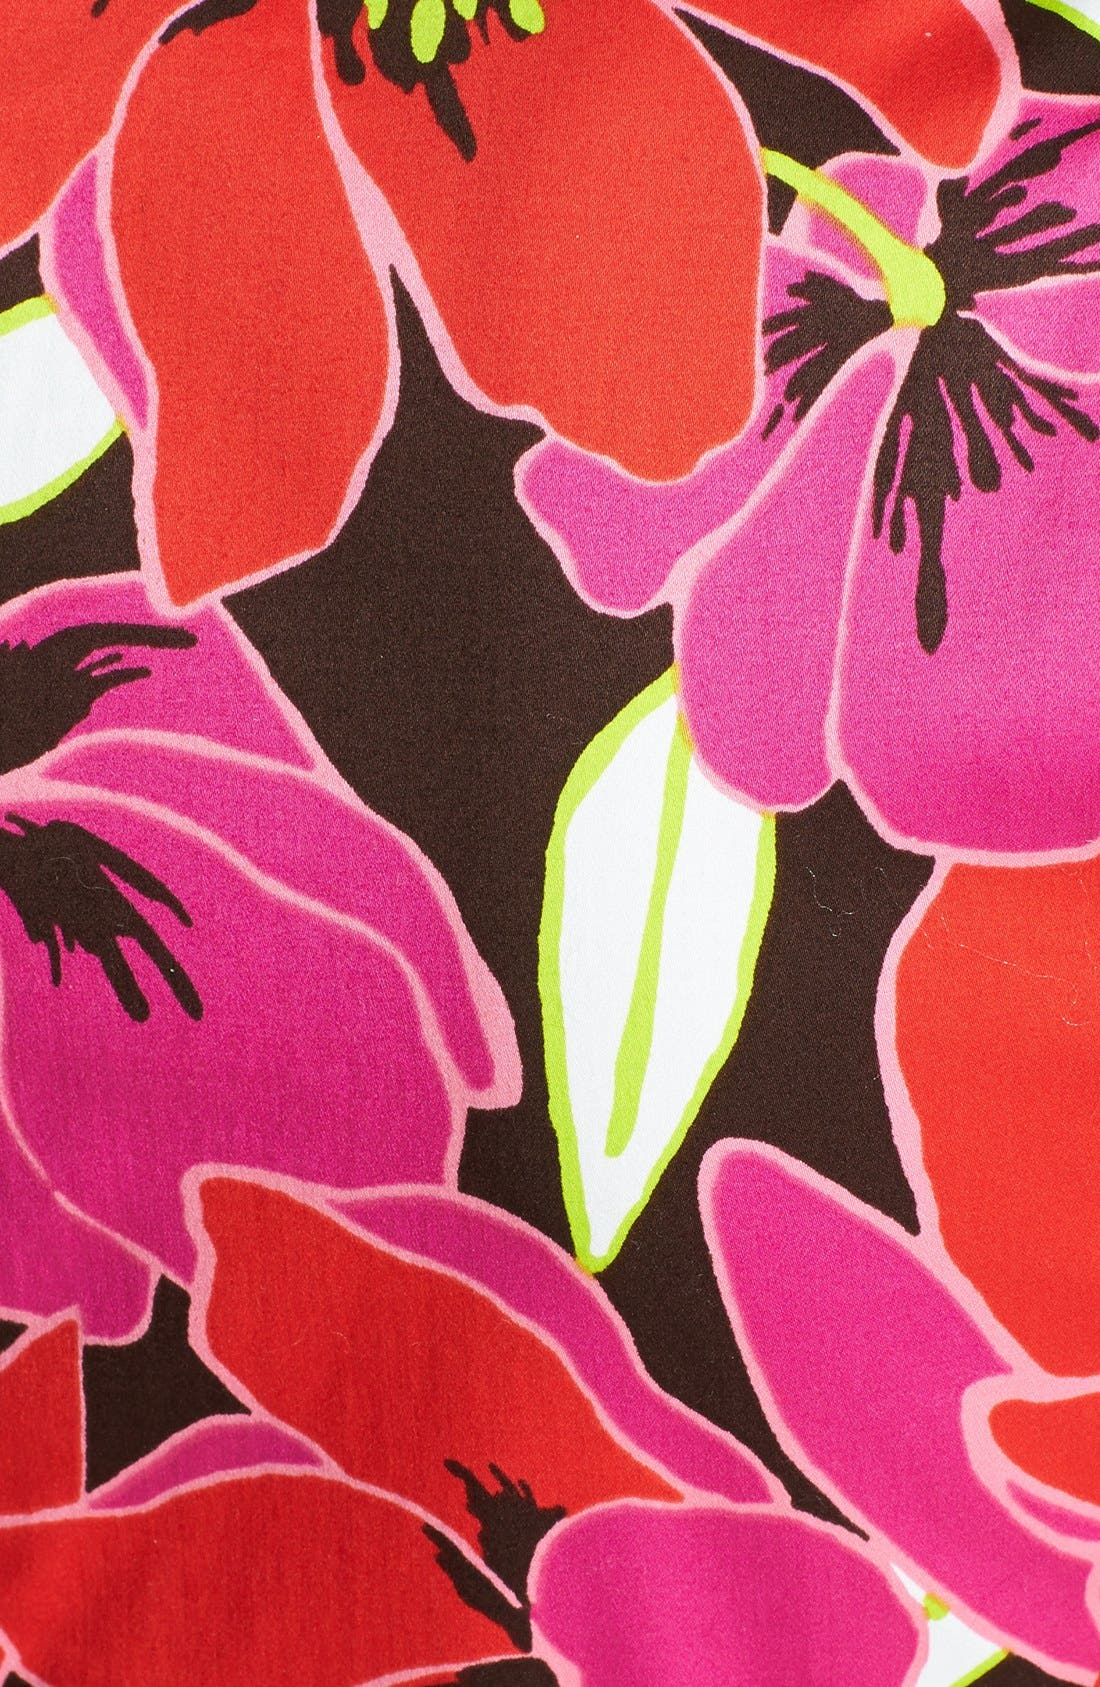 KATE SPADE NEW YORK,                             tropical print peplum sheath dress,                             Alternate thumbnail 3, color,                             650